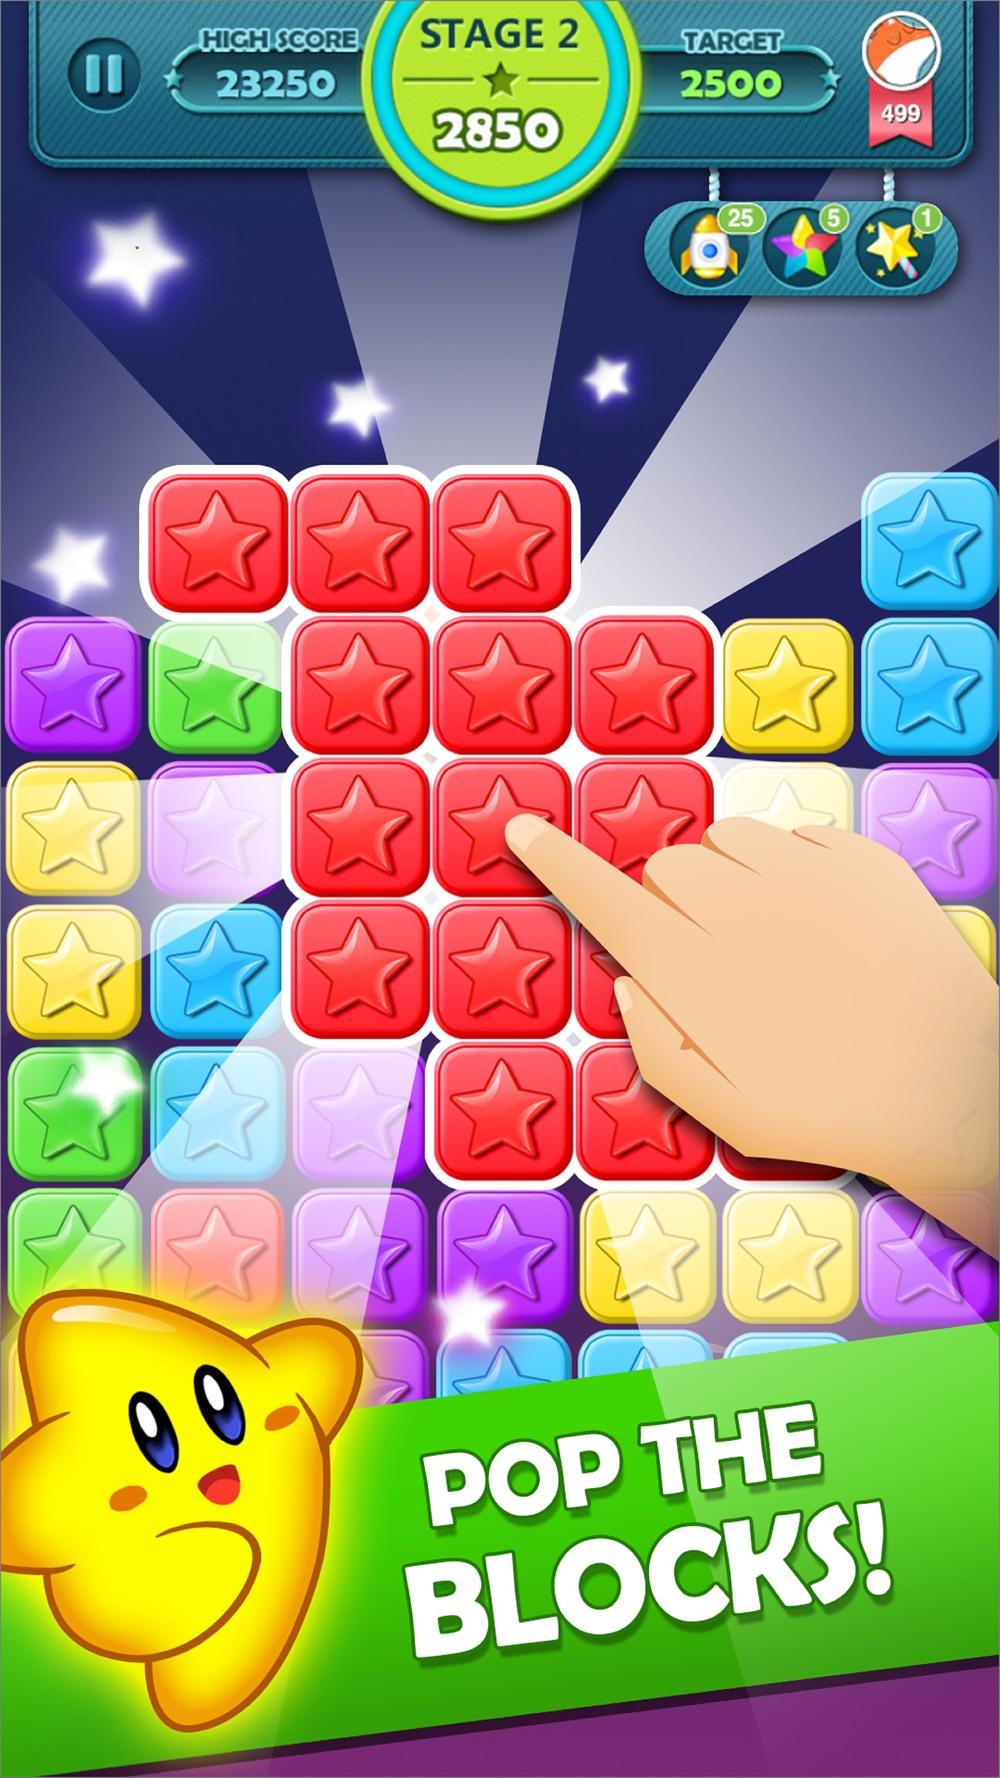 Star Blast: Pop matching star puzzle game Cheat Codes